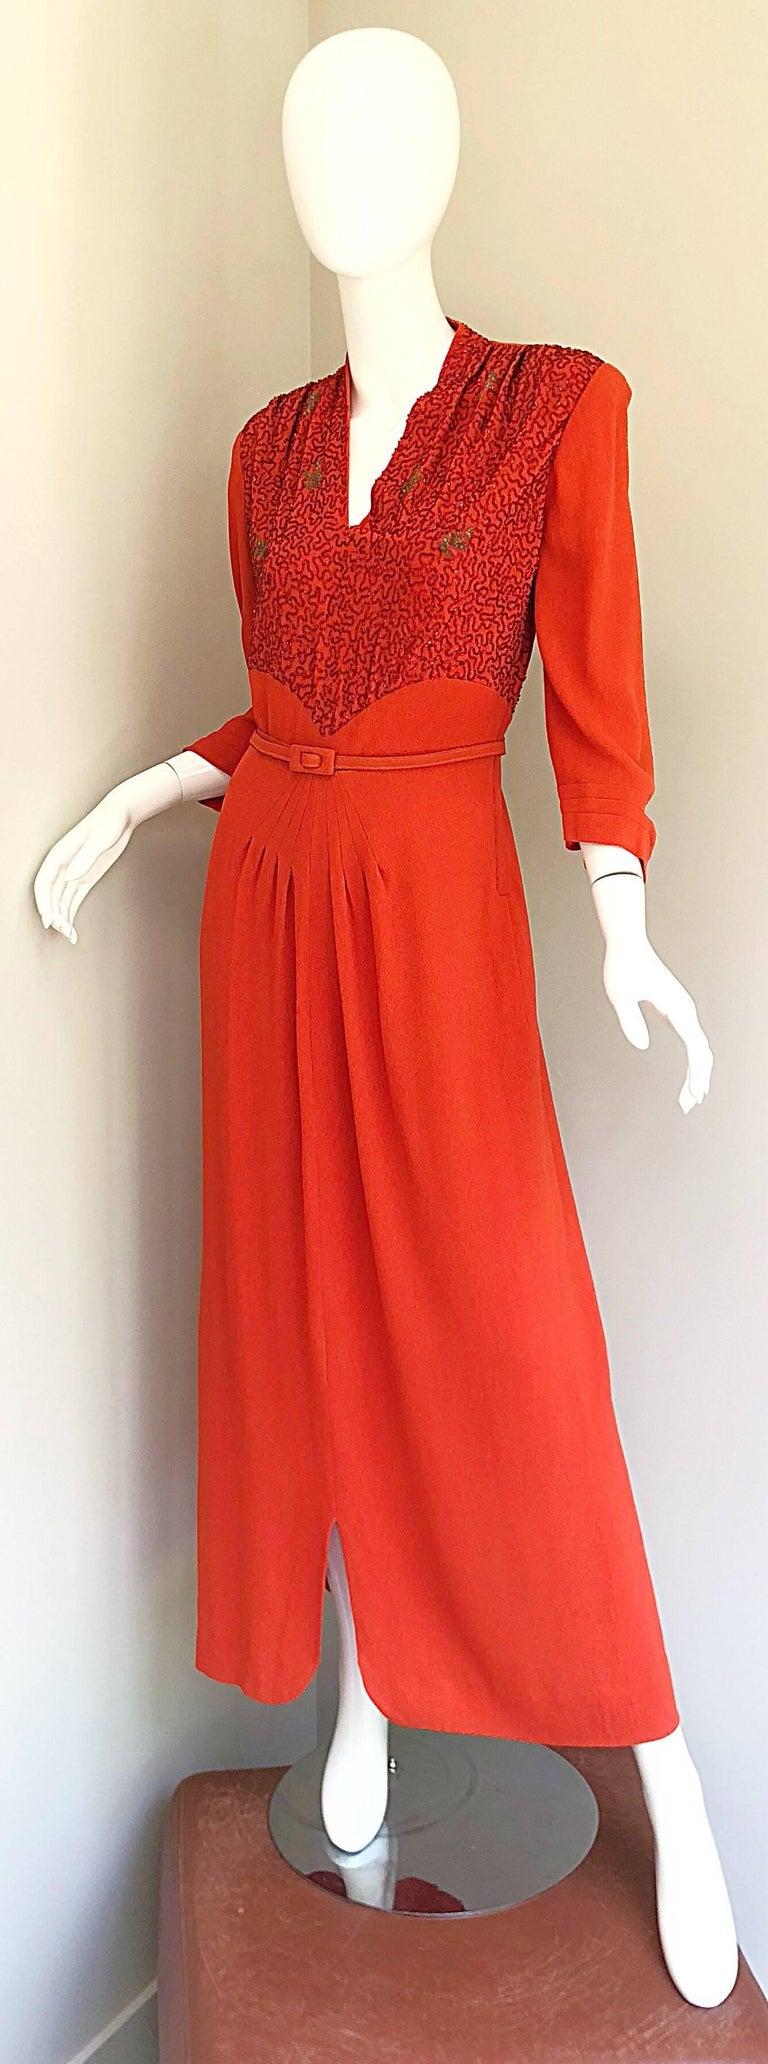 1940s Kornhauser Original Burnt Orange Beaded Vintage 40s Couture Crepe Gown For Sale 8